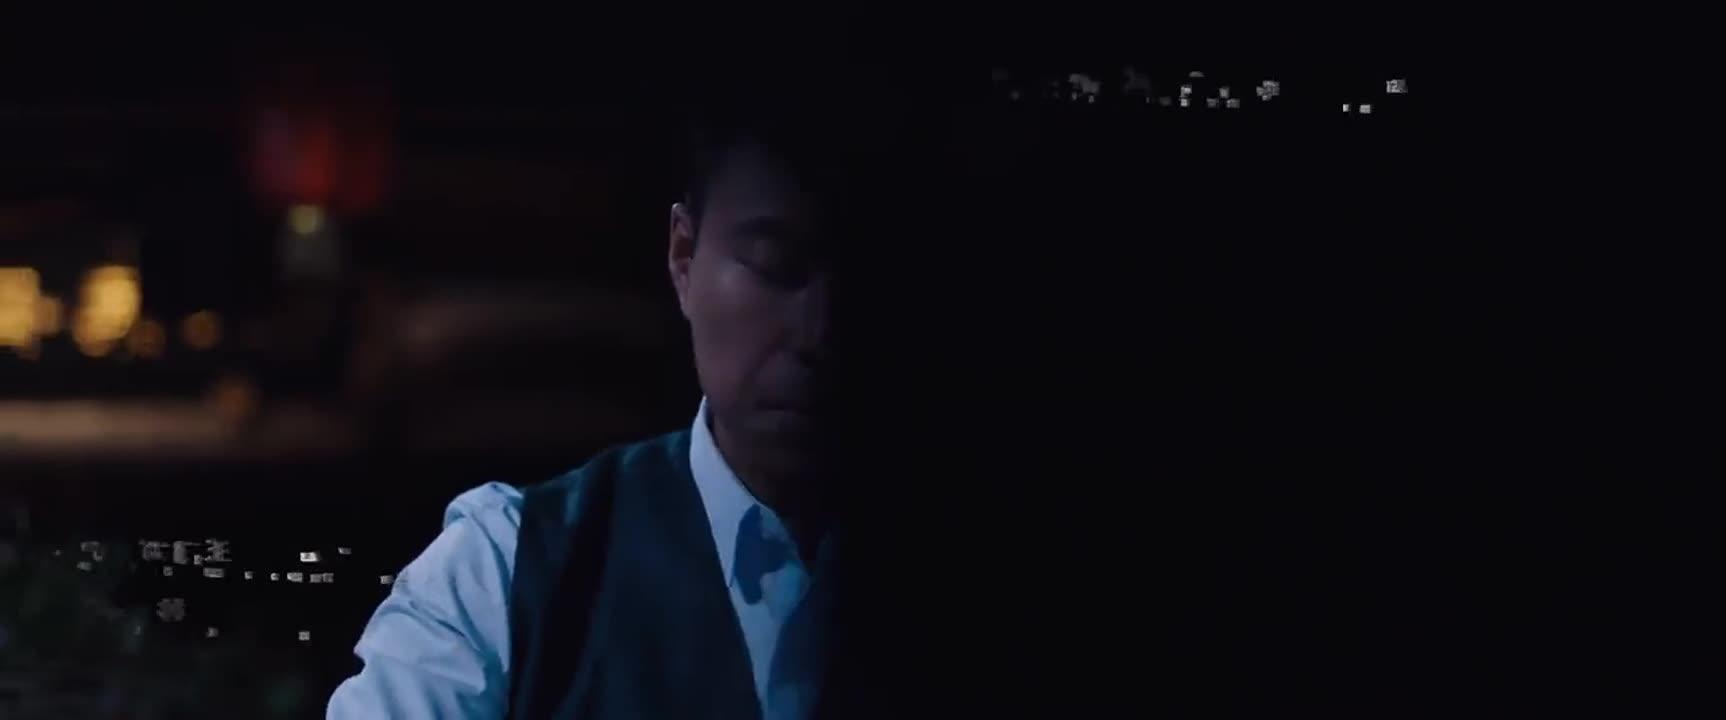 The Vindicator (2020)